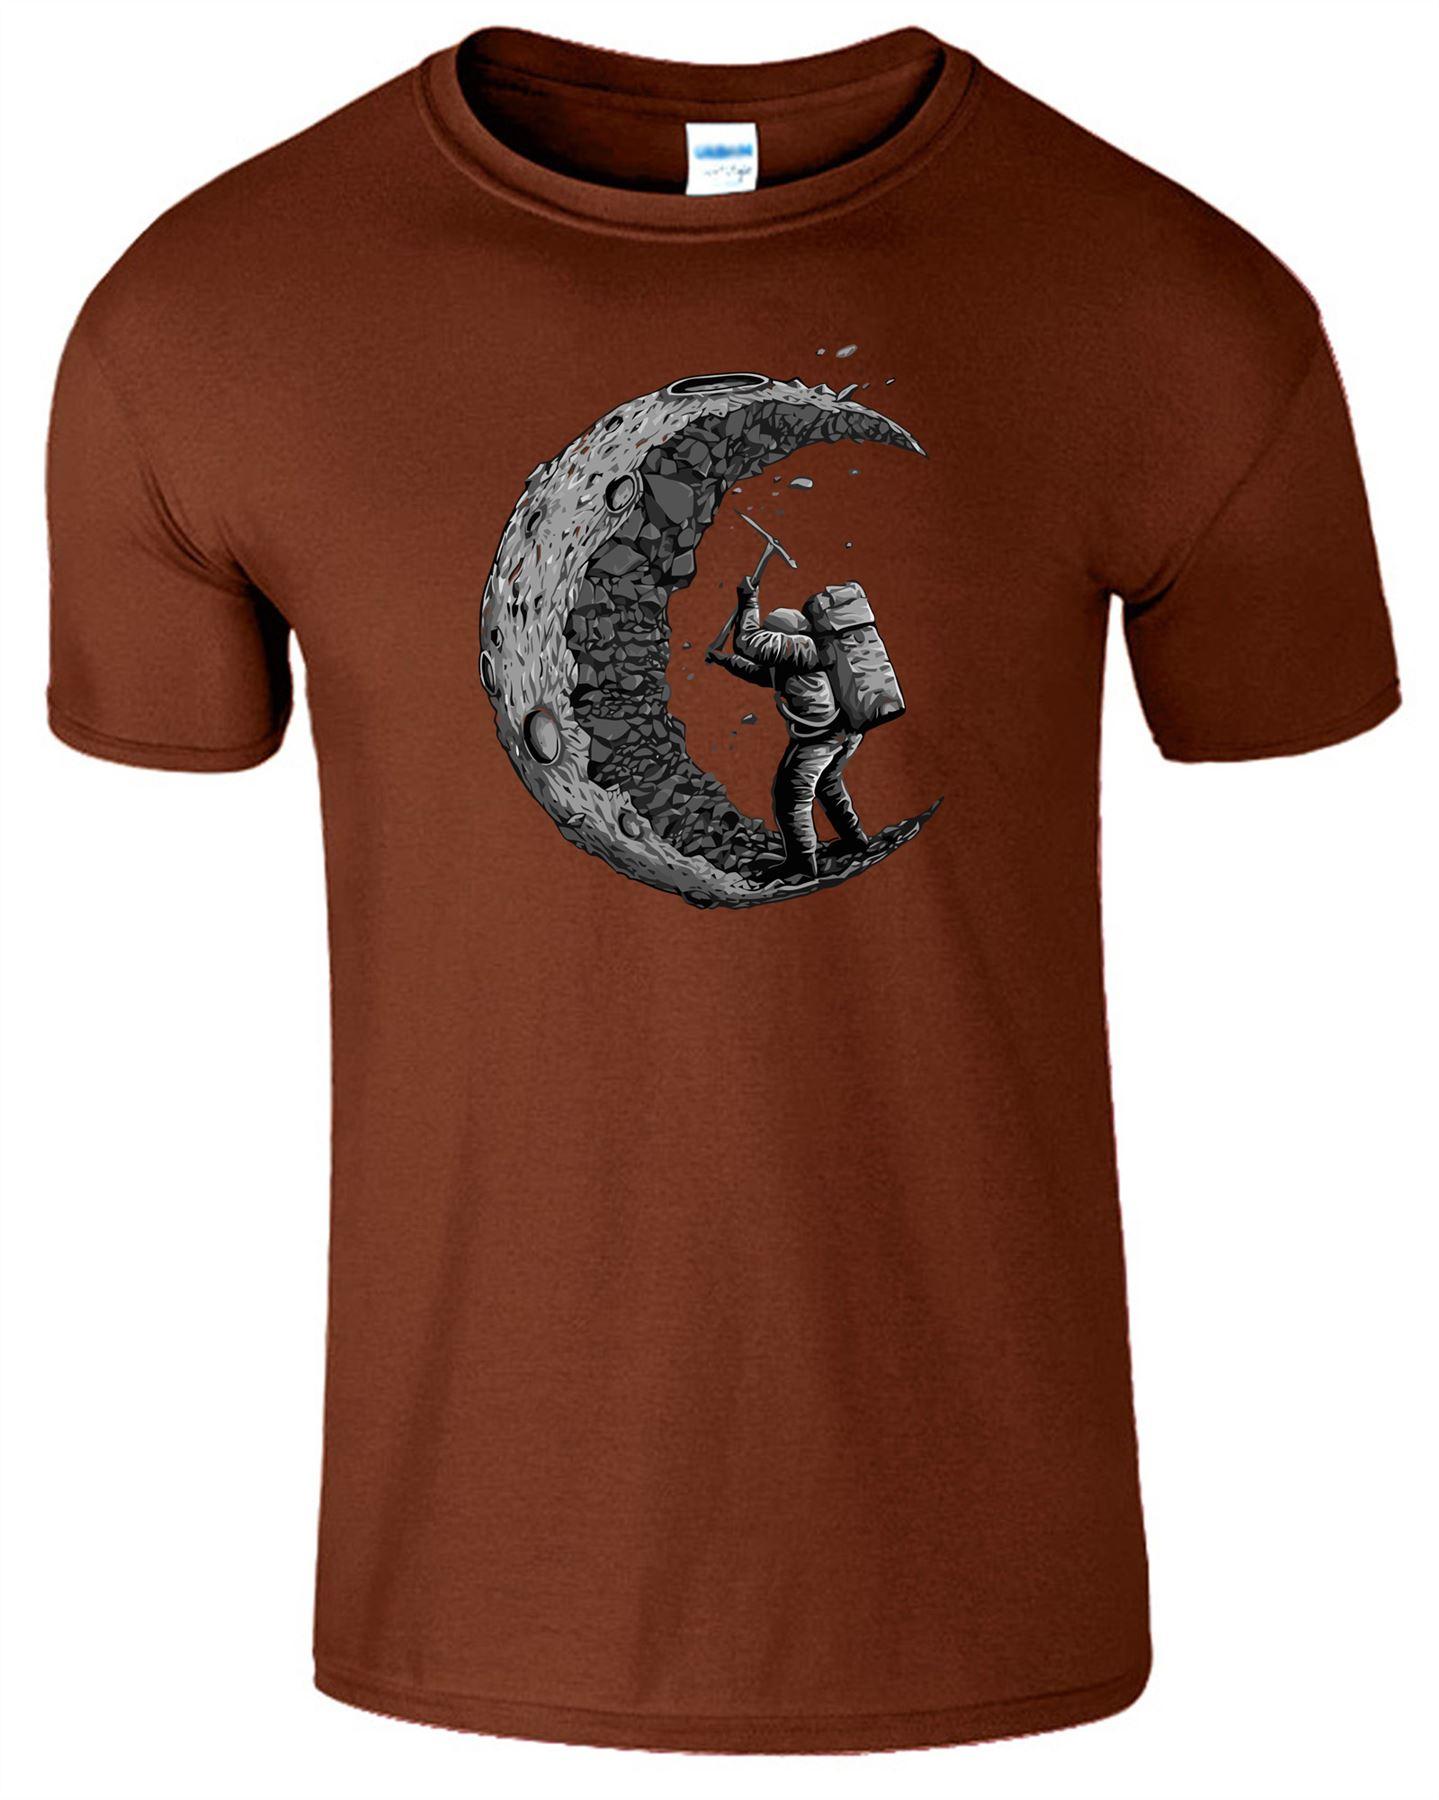 Digging The Moon Design Kids Mens Tshirt Funny Printed Short Sleeve T-Shirts